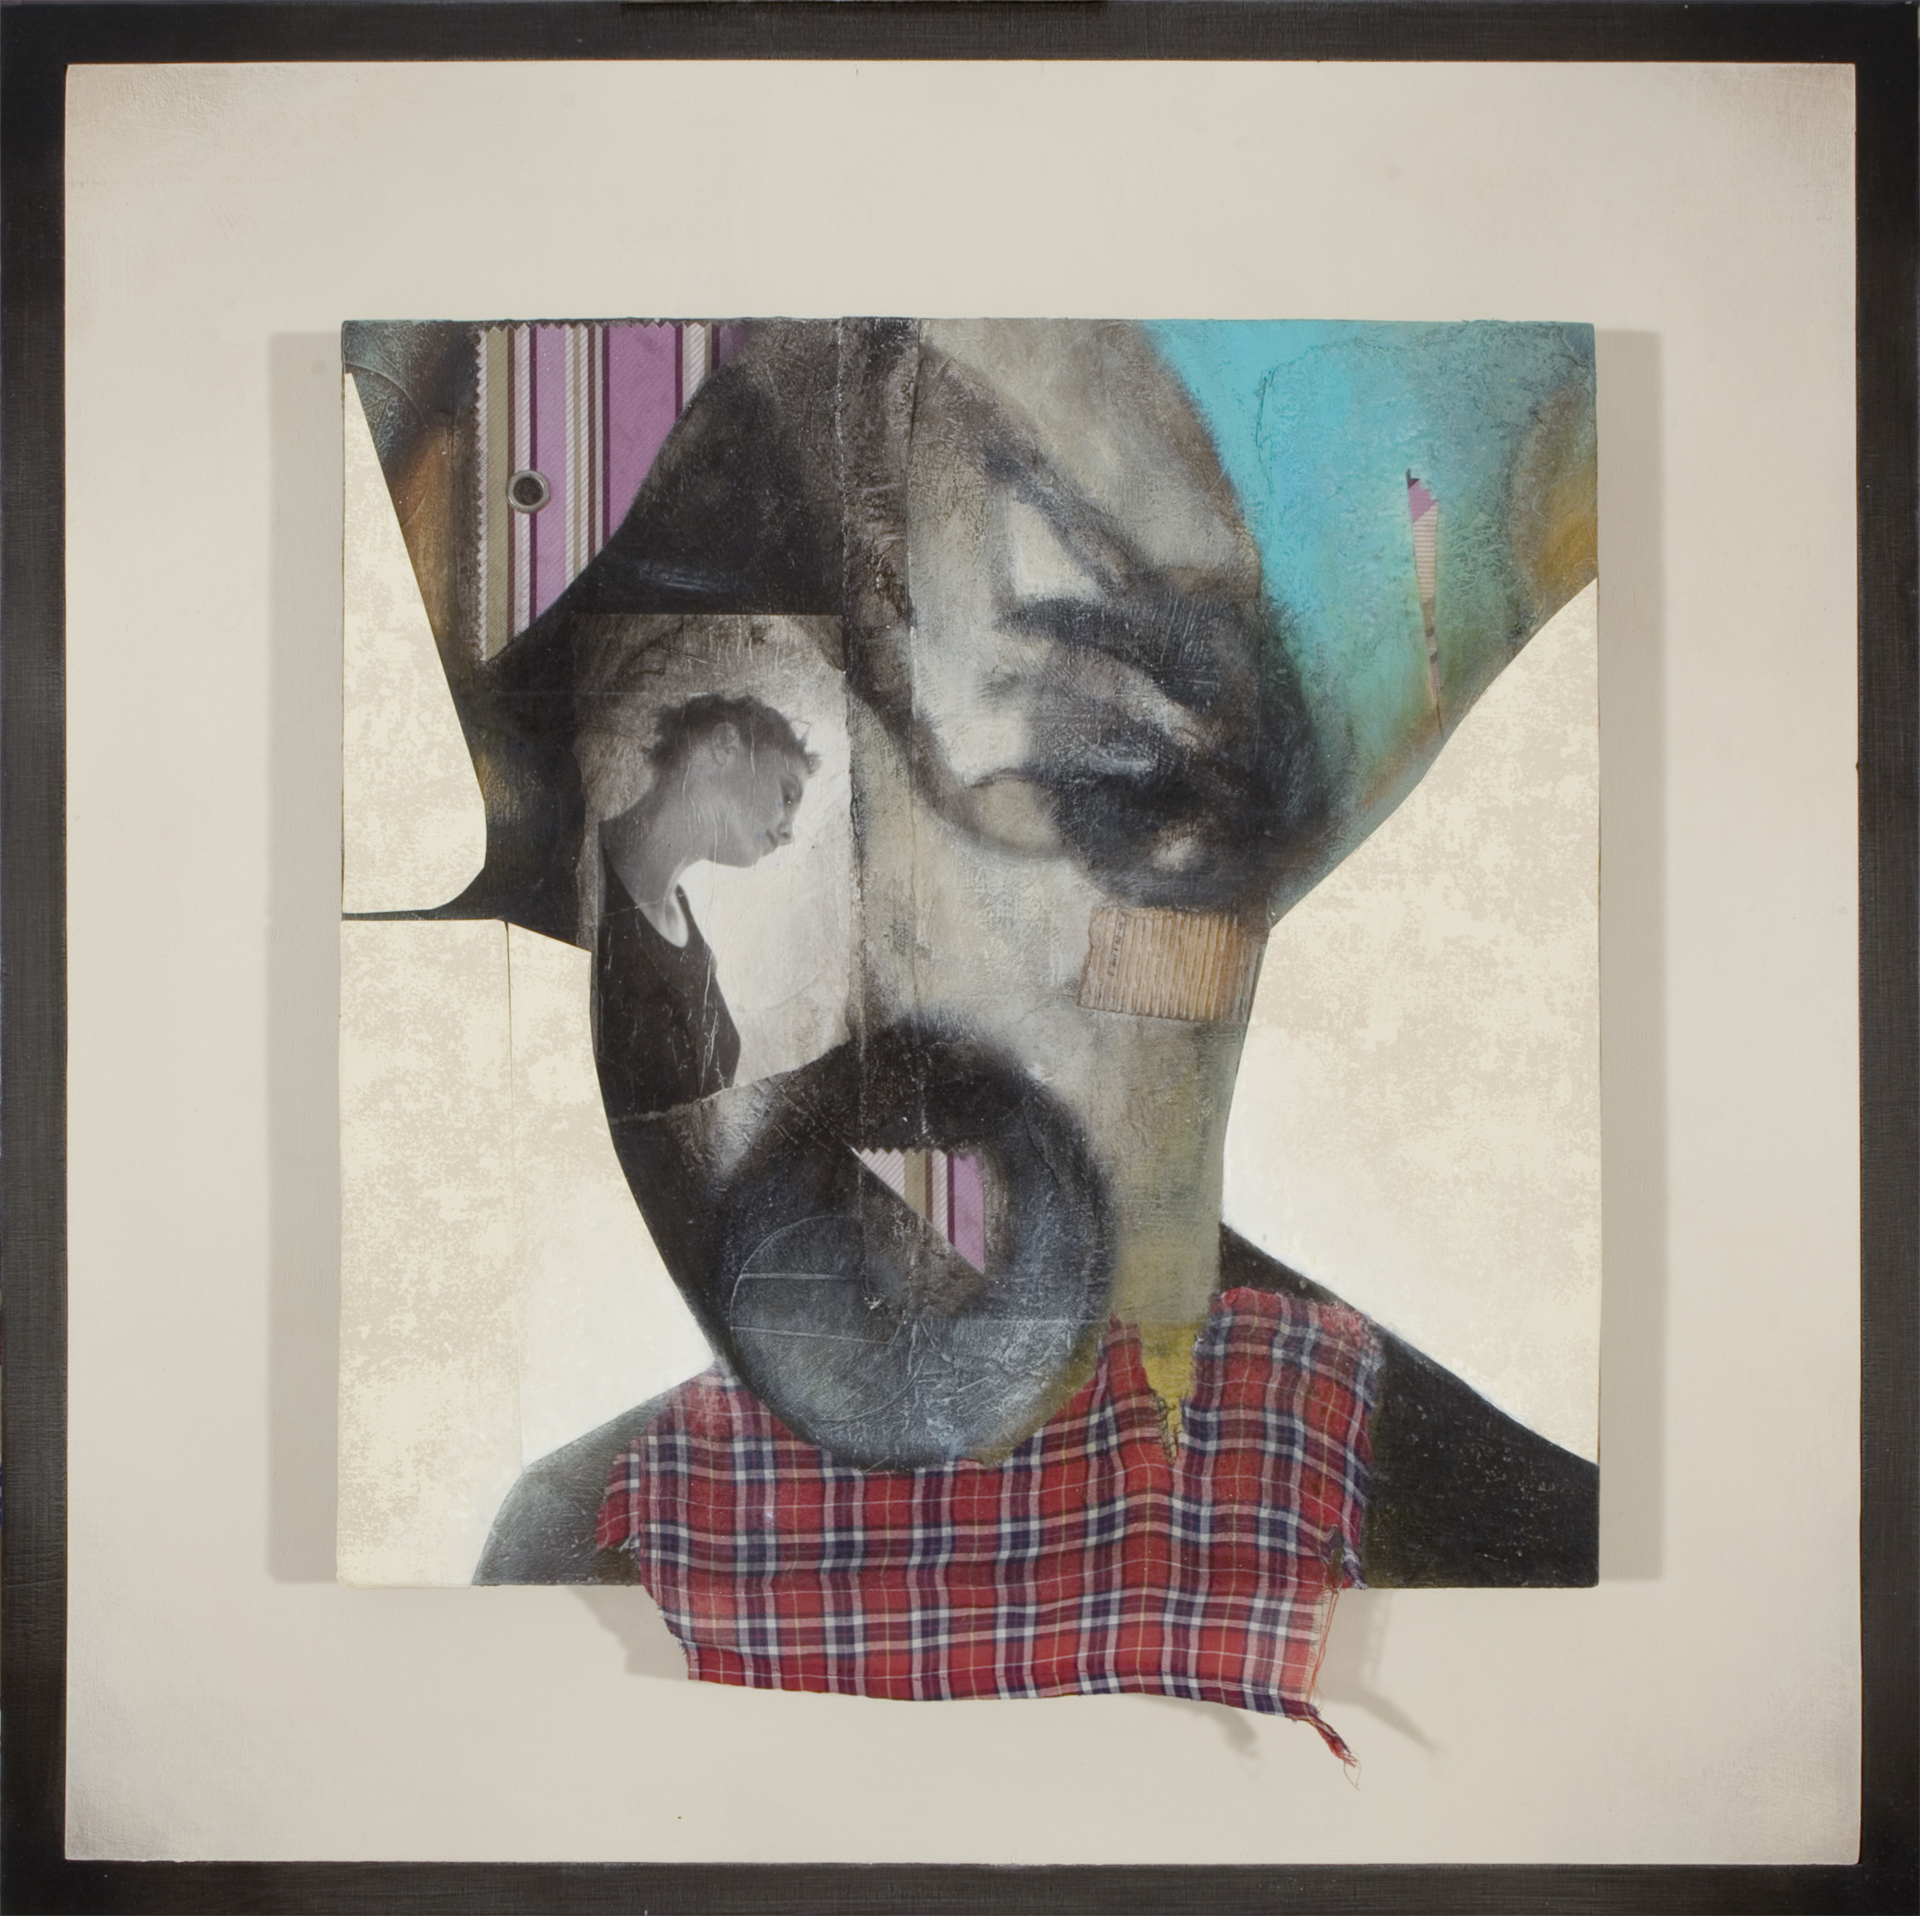 Reconfigured by Michael Gadlin